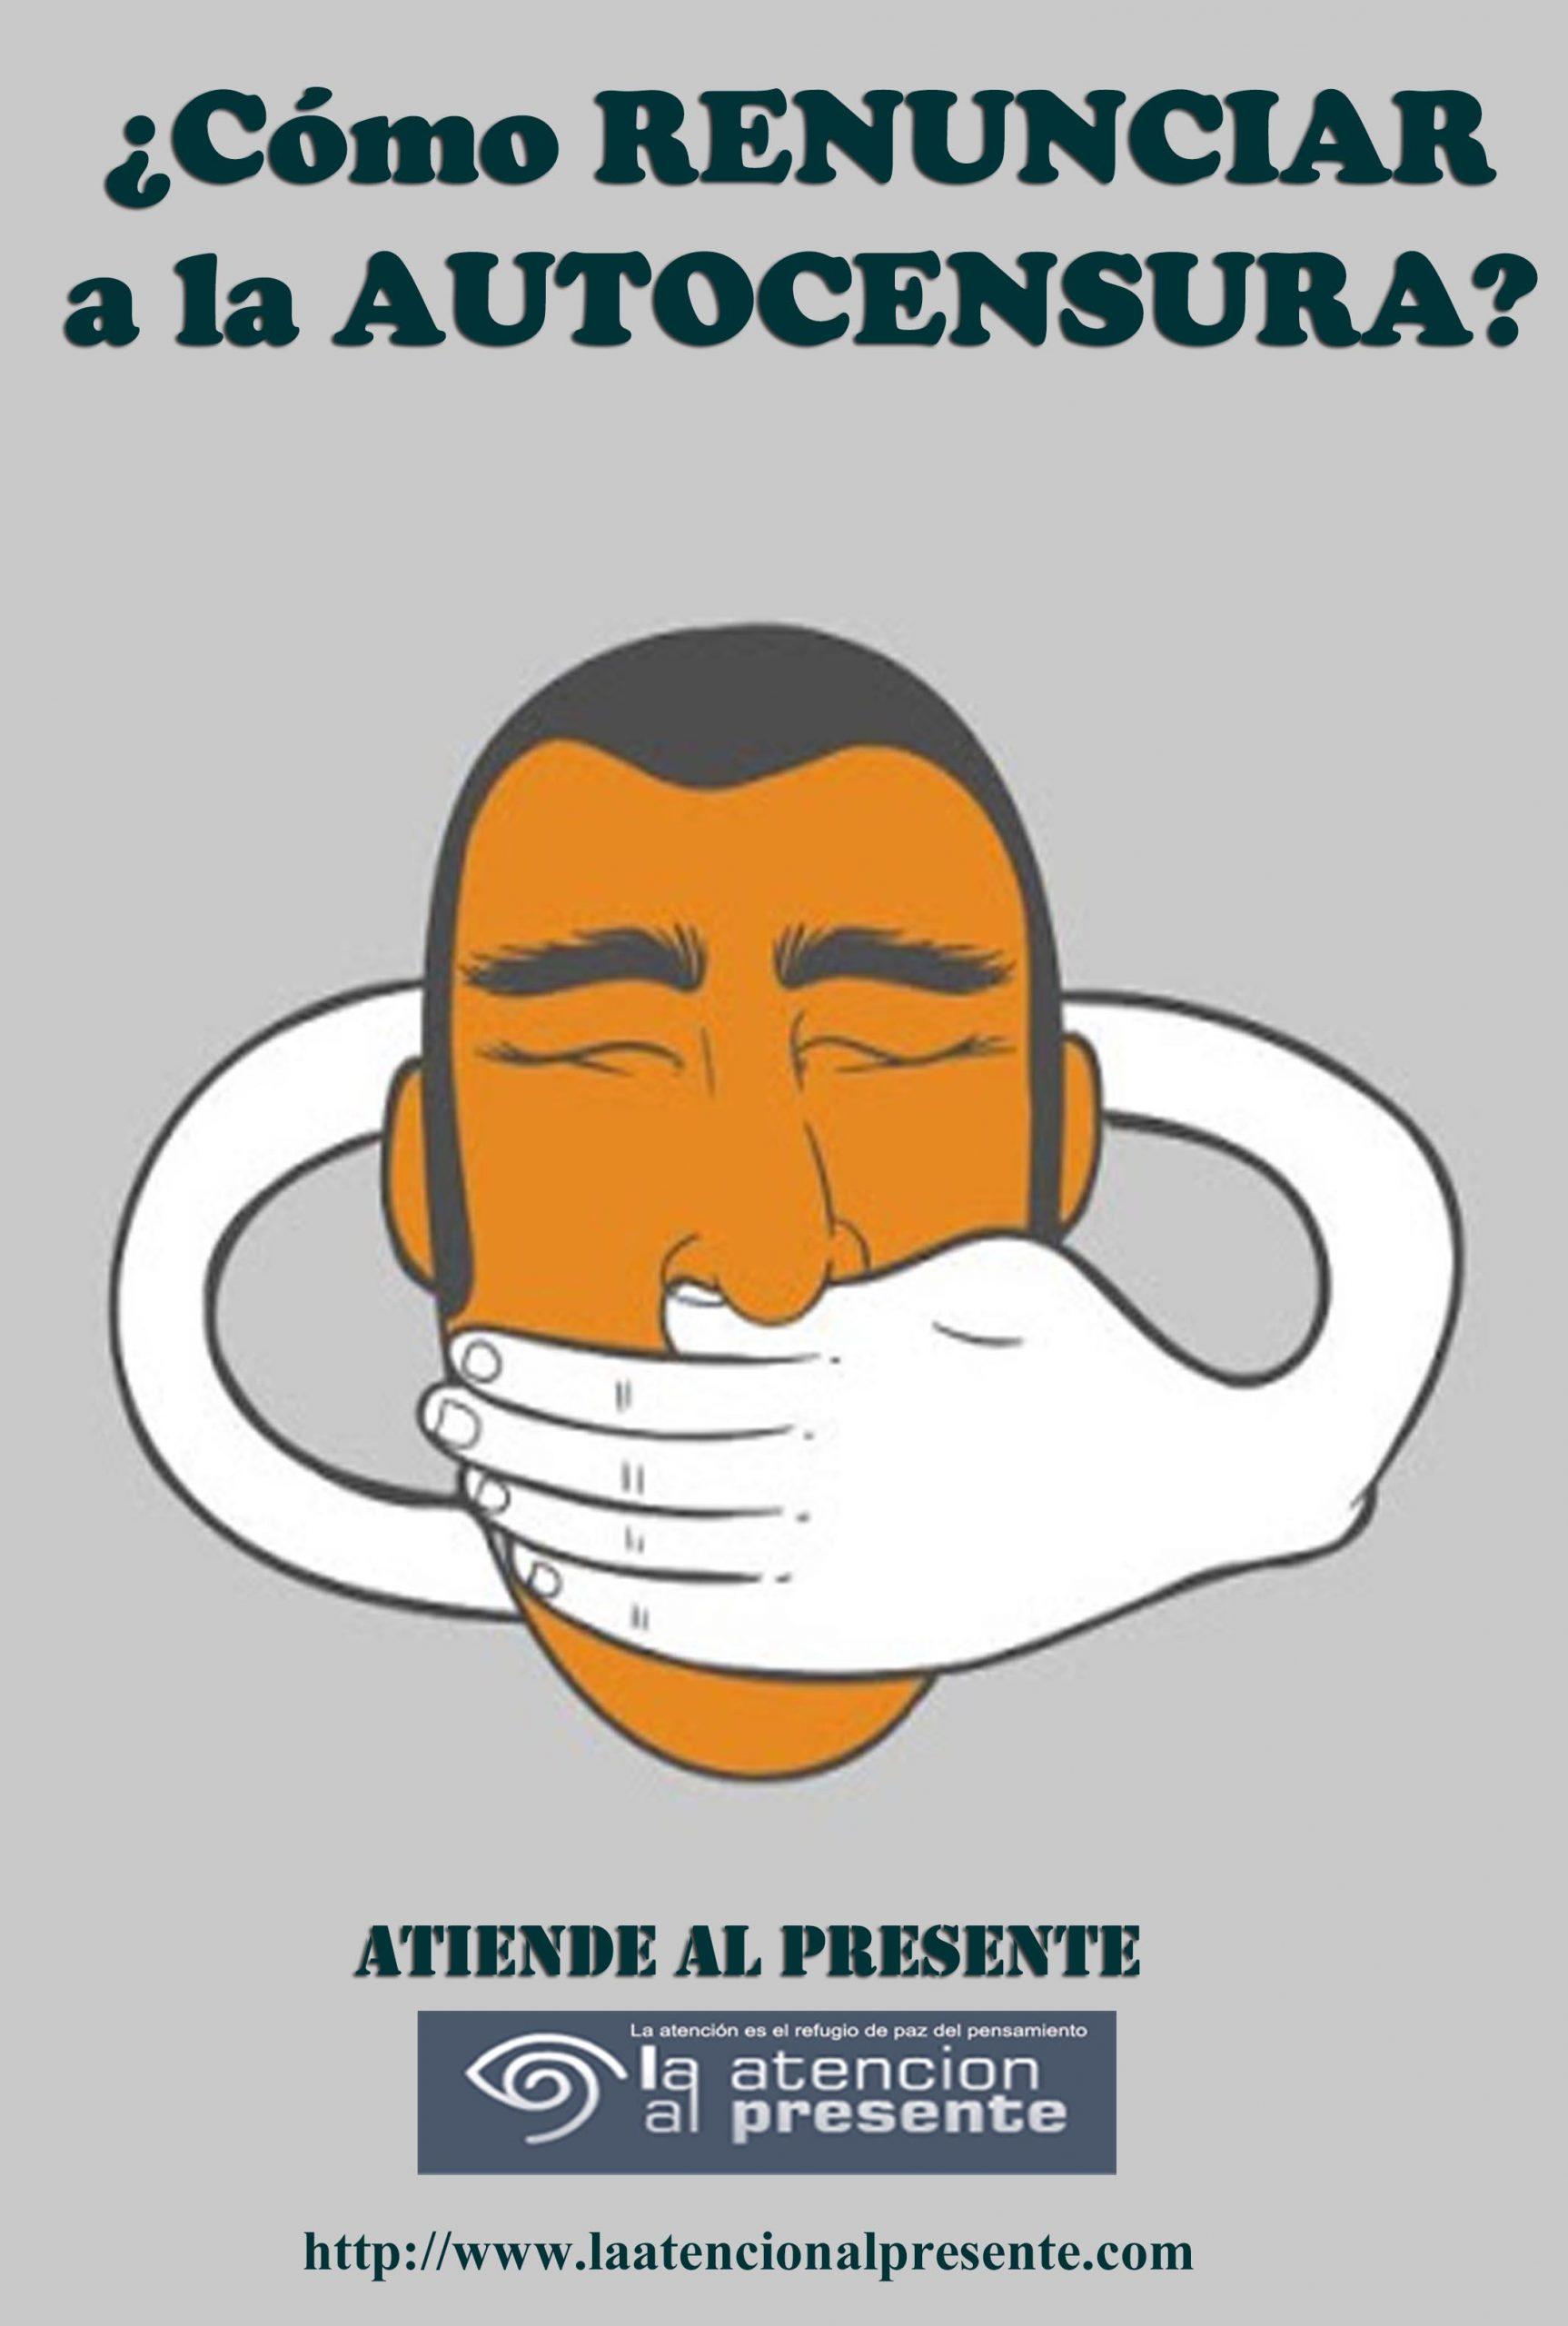 25 de Octubre Esteban Como renunciar a la autocensura min scaled